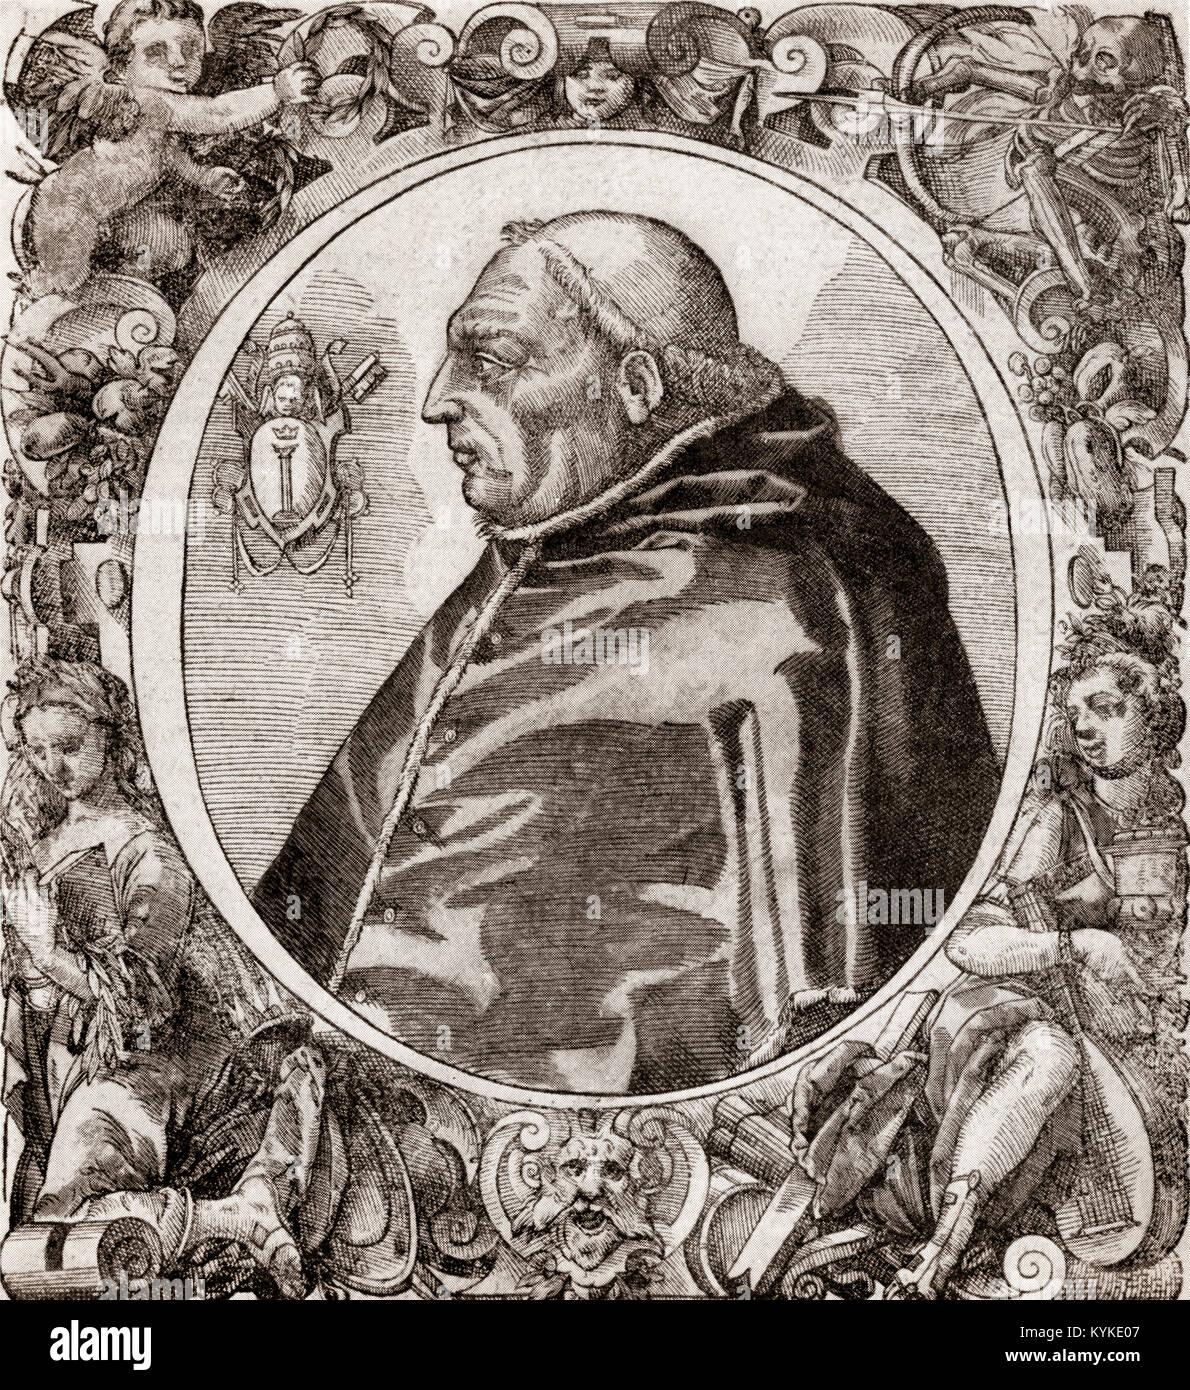 Martinus V, 1369 -1431, born Otto or Oddone Colonna, Pope from 1417 to 1431 - Stock Image